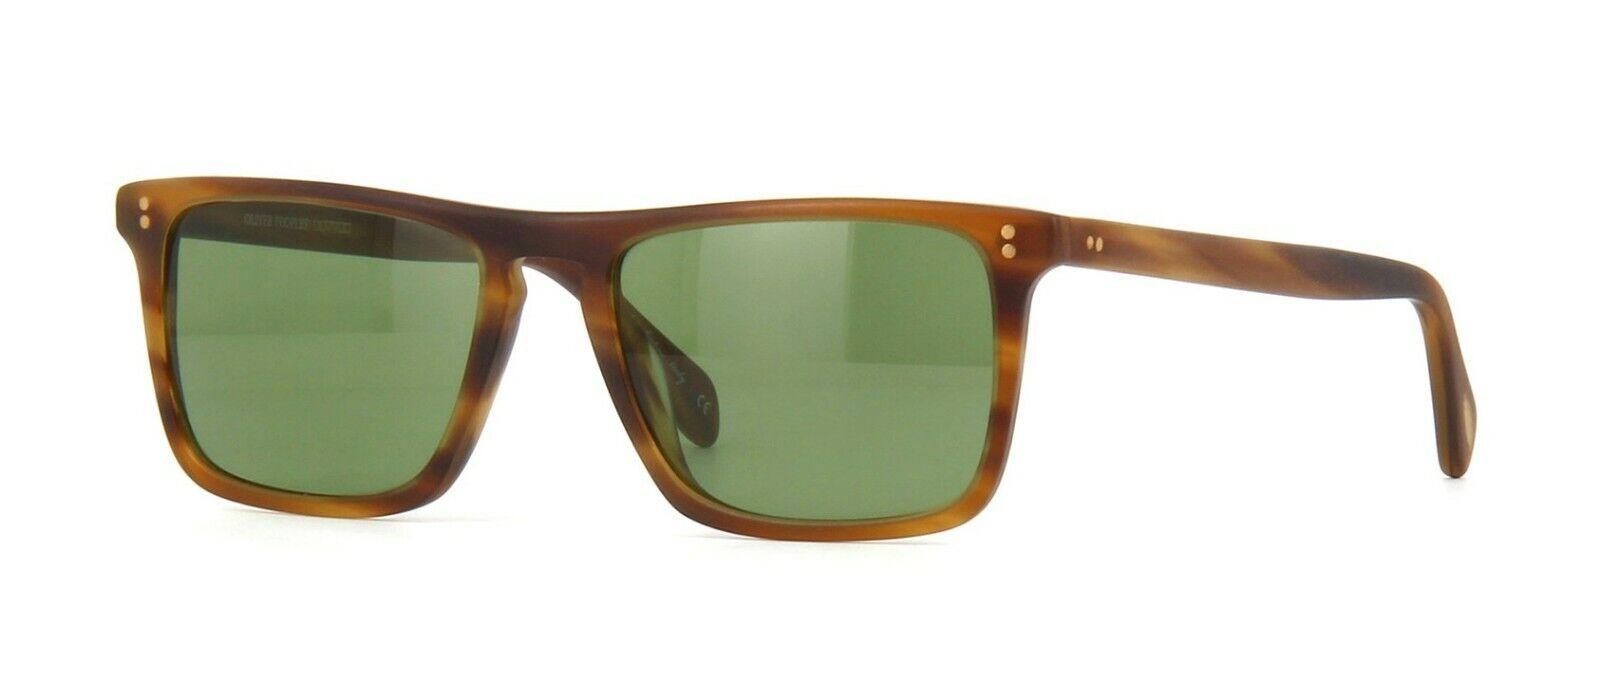 Oliver Peoples NDG-1 SUN OV 5031S Buff//Green C 1094//52 A Sunglasses